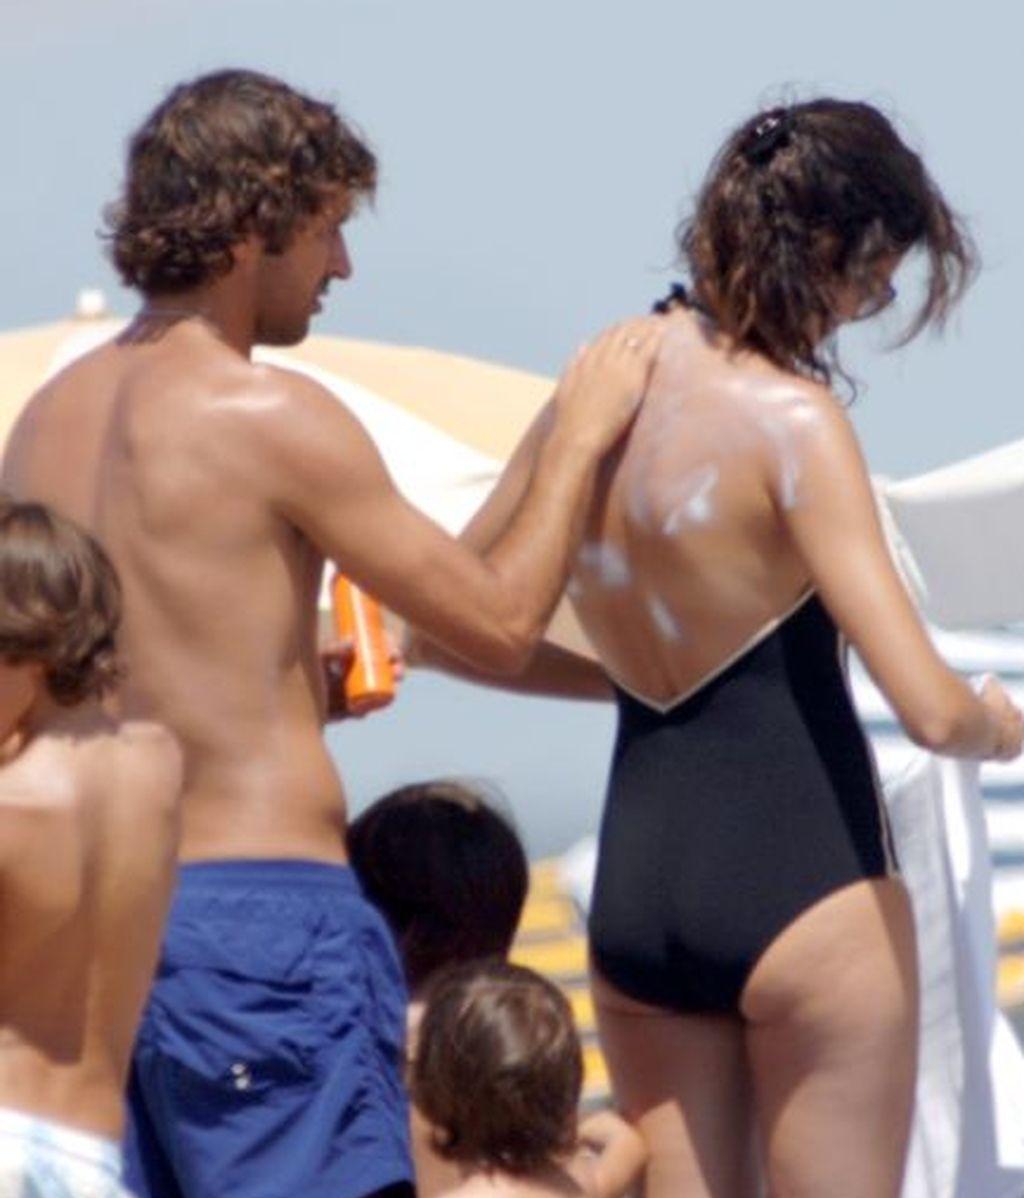 Raúl pone crema a su chica, Mamen Sanz